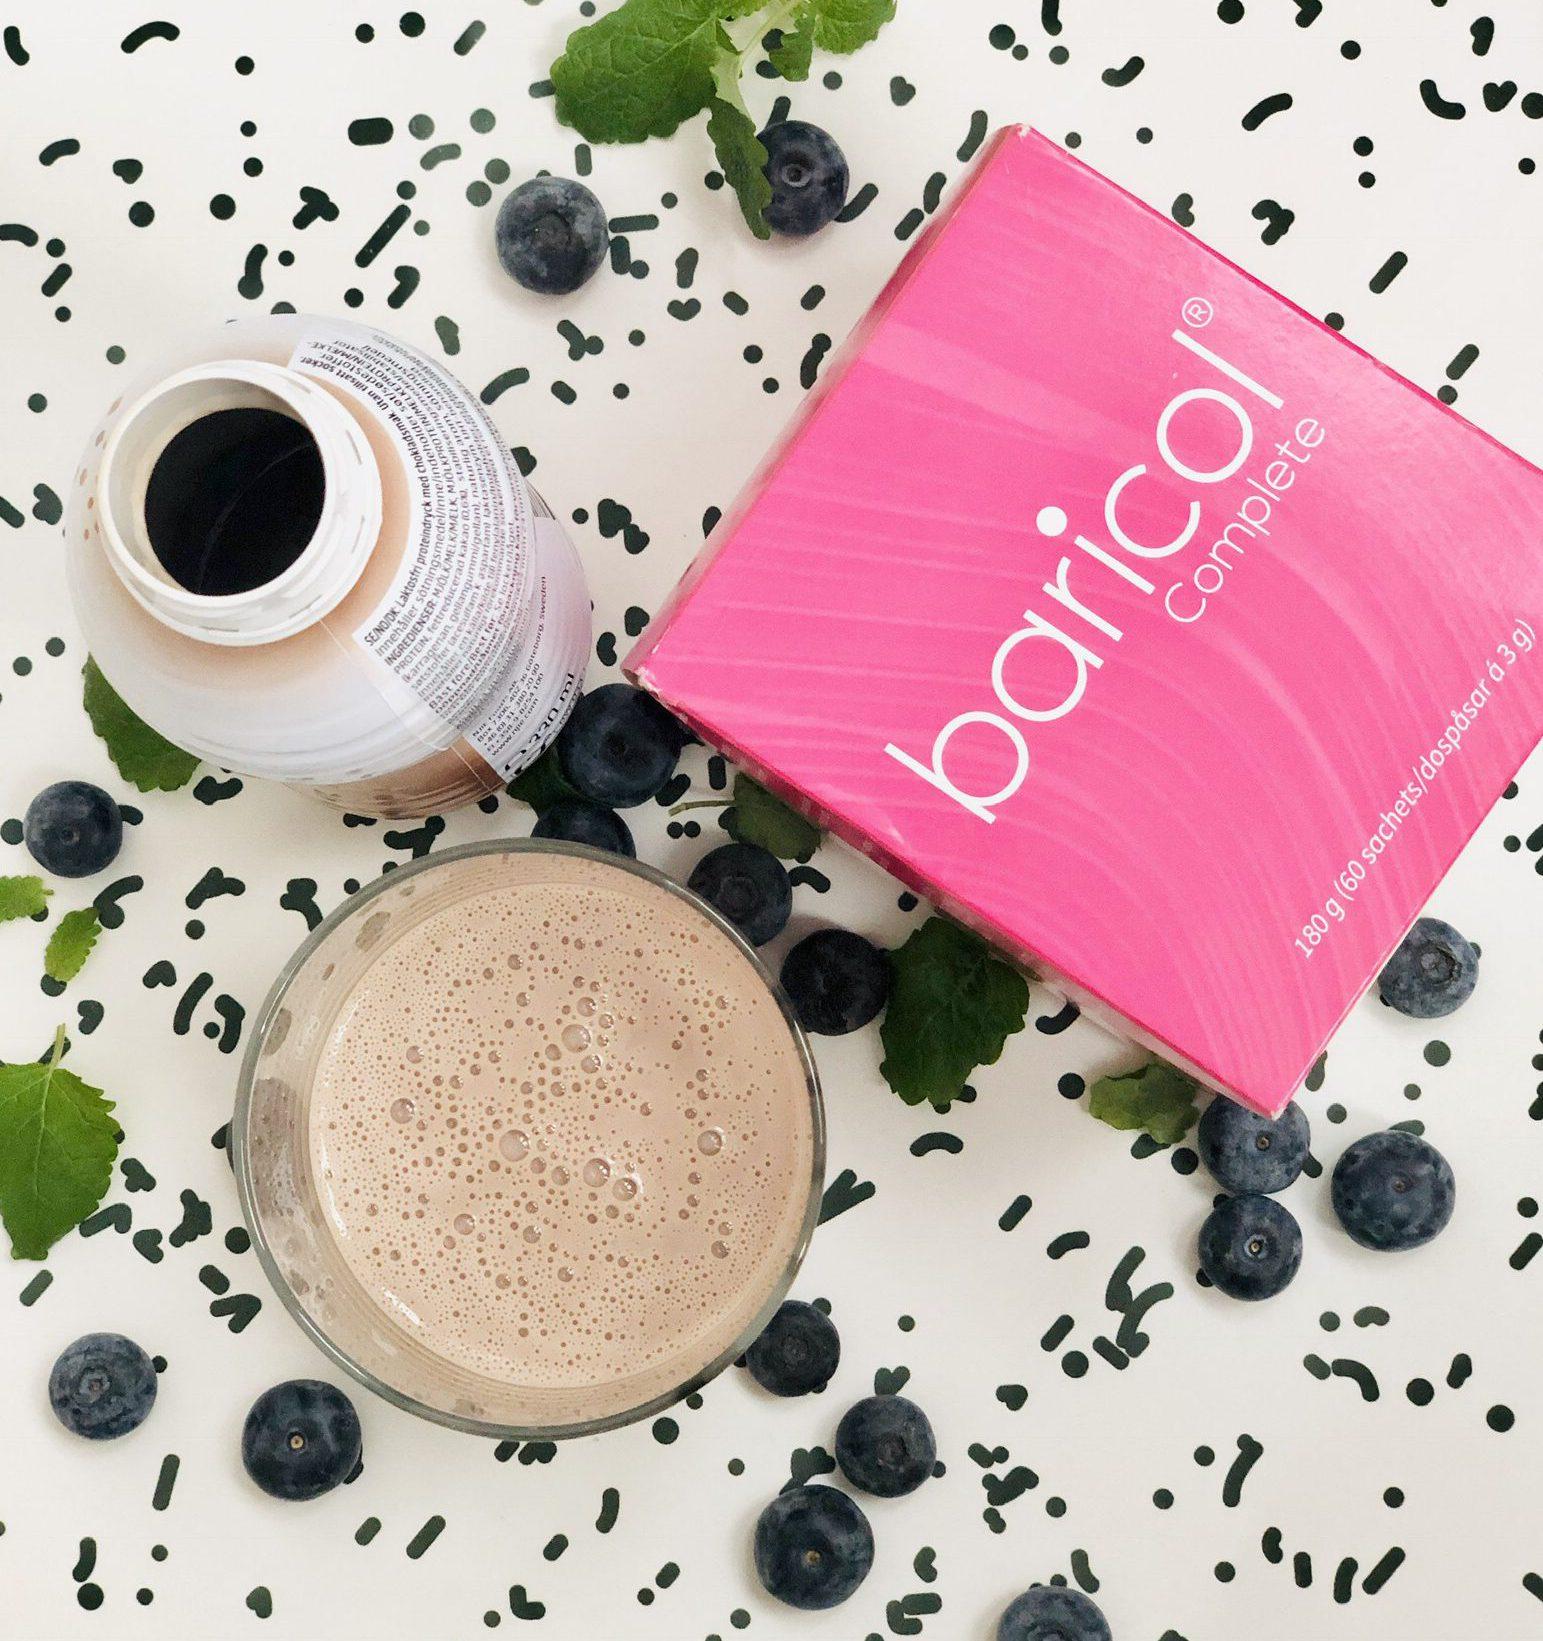 Baricol Complete pulver ask, proteinshakeflaska glas med shake i